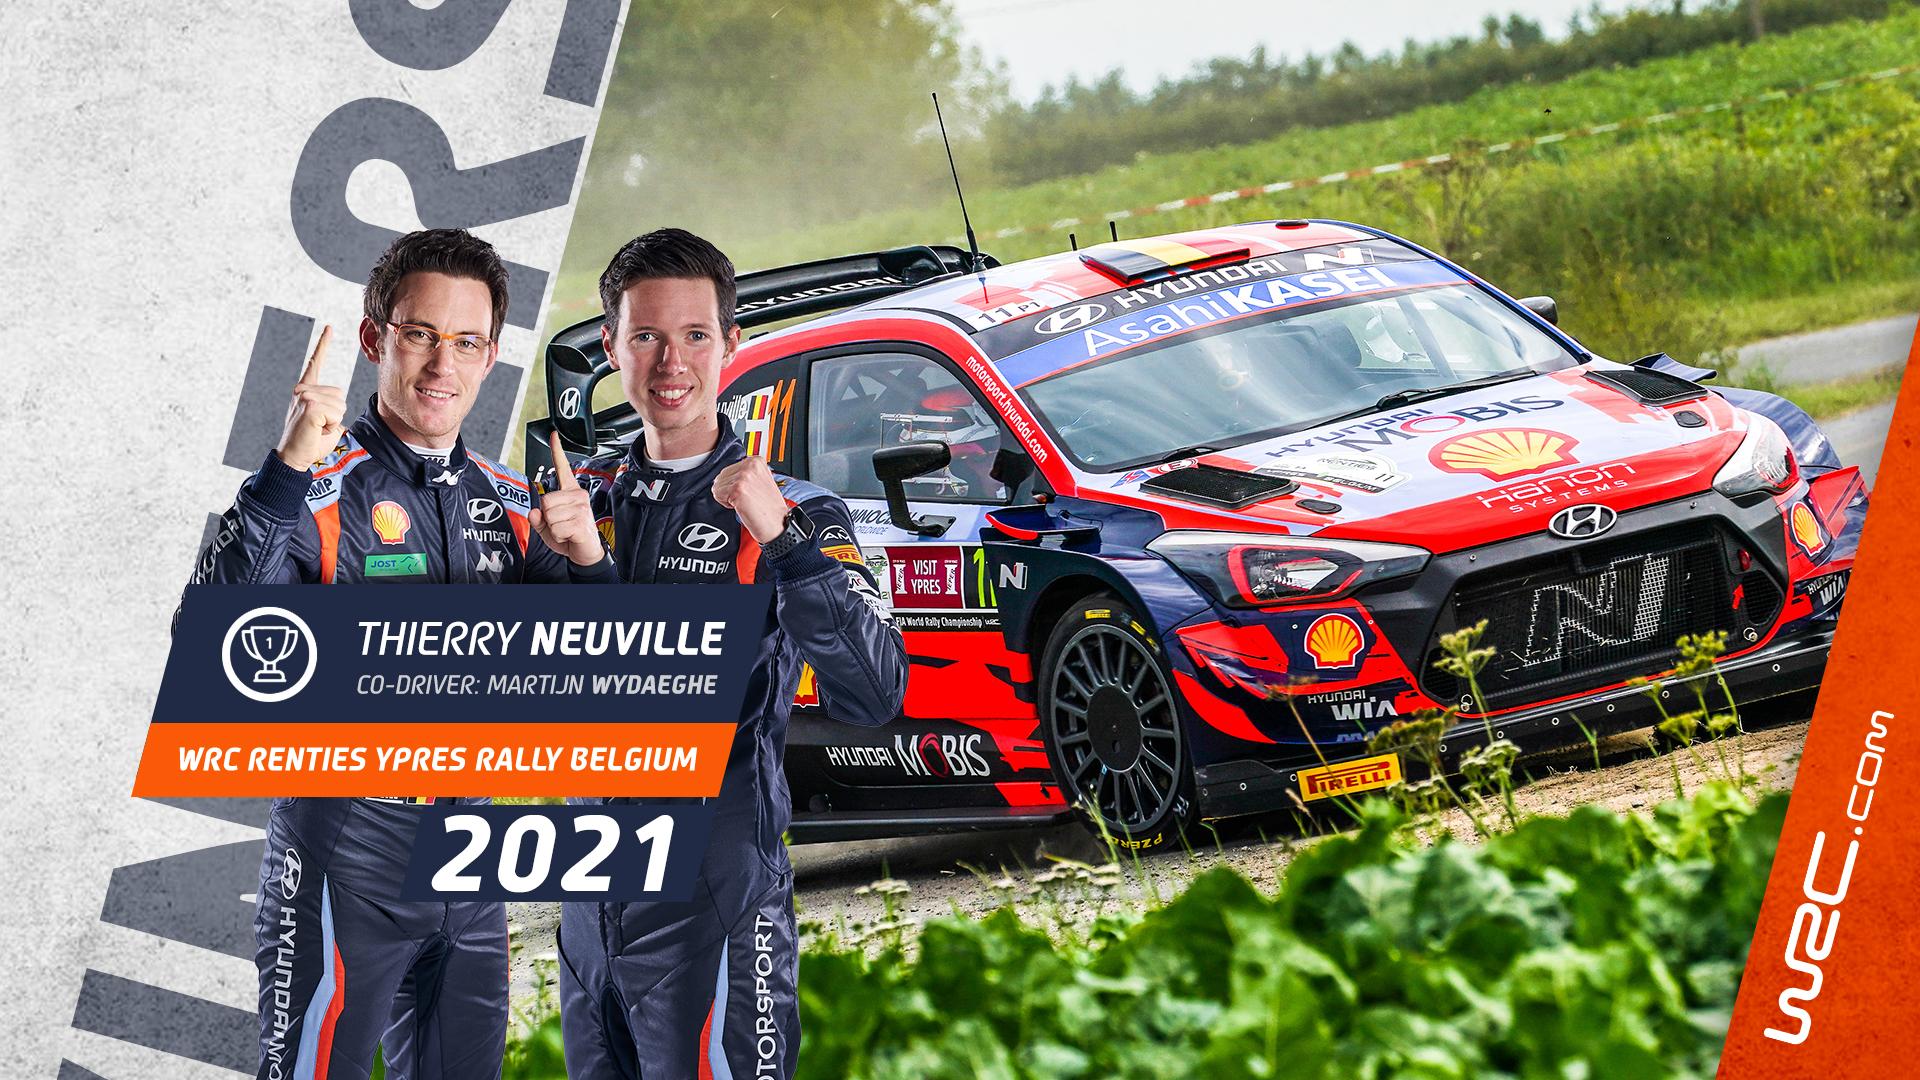 WRC: RENTIES Ypres Rally [13-15 Agosto] - Página 5 150821_winner-NEUV-16_9_BEL